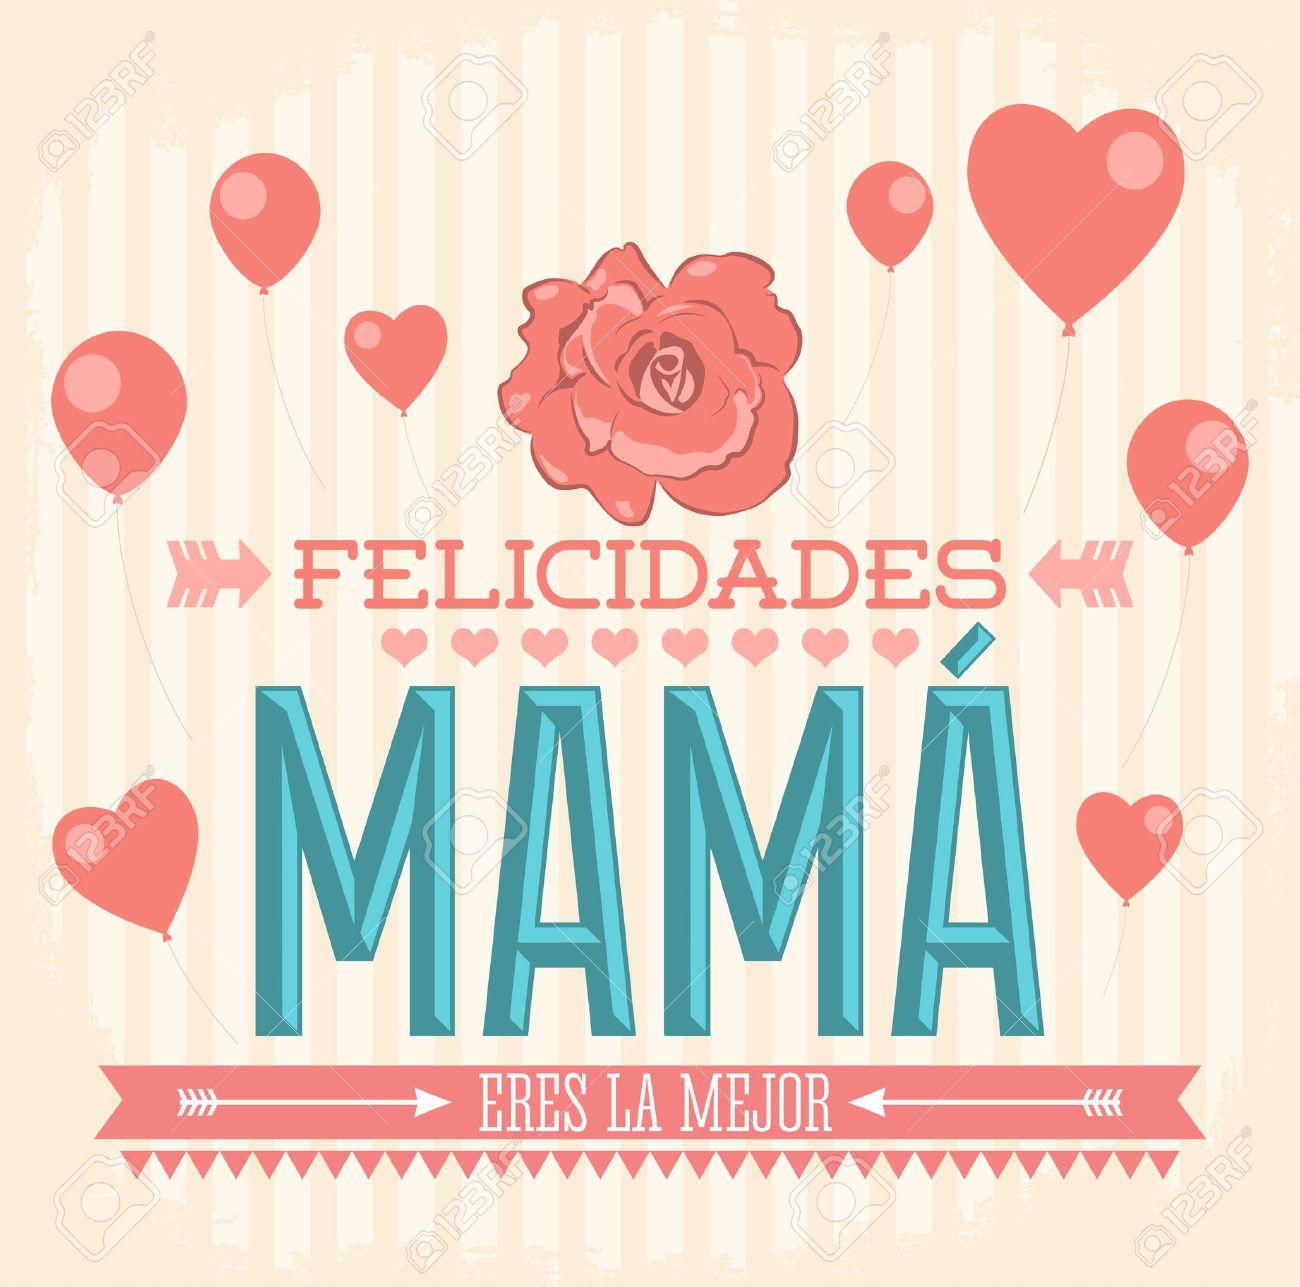 Felicidades Mama, Congrats Mother spanish text - Vintage vector illustration - 27736328